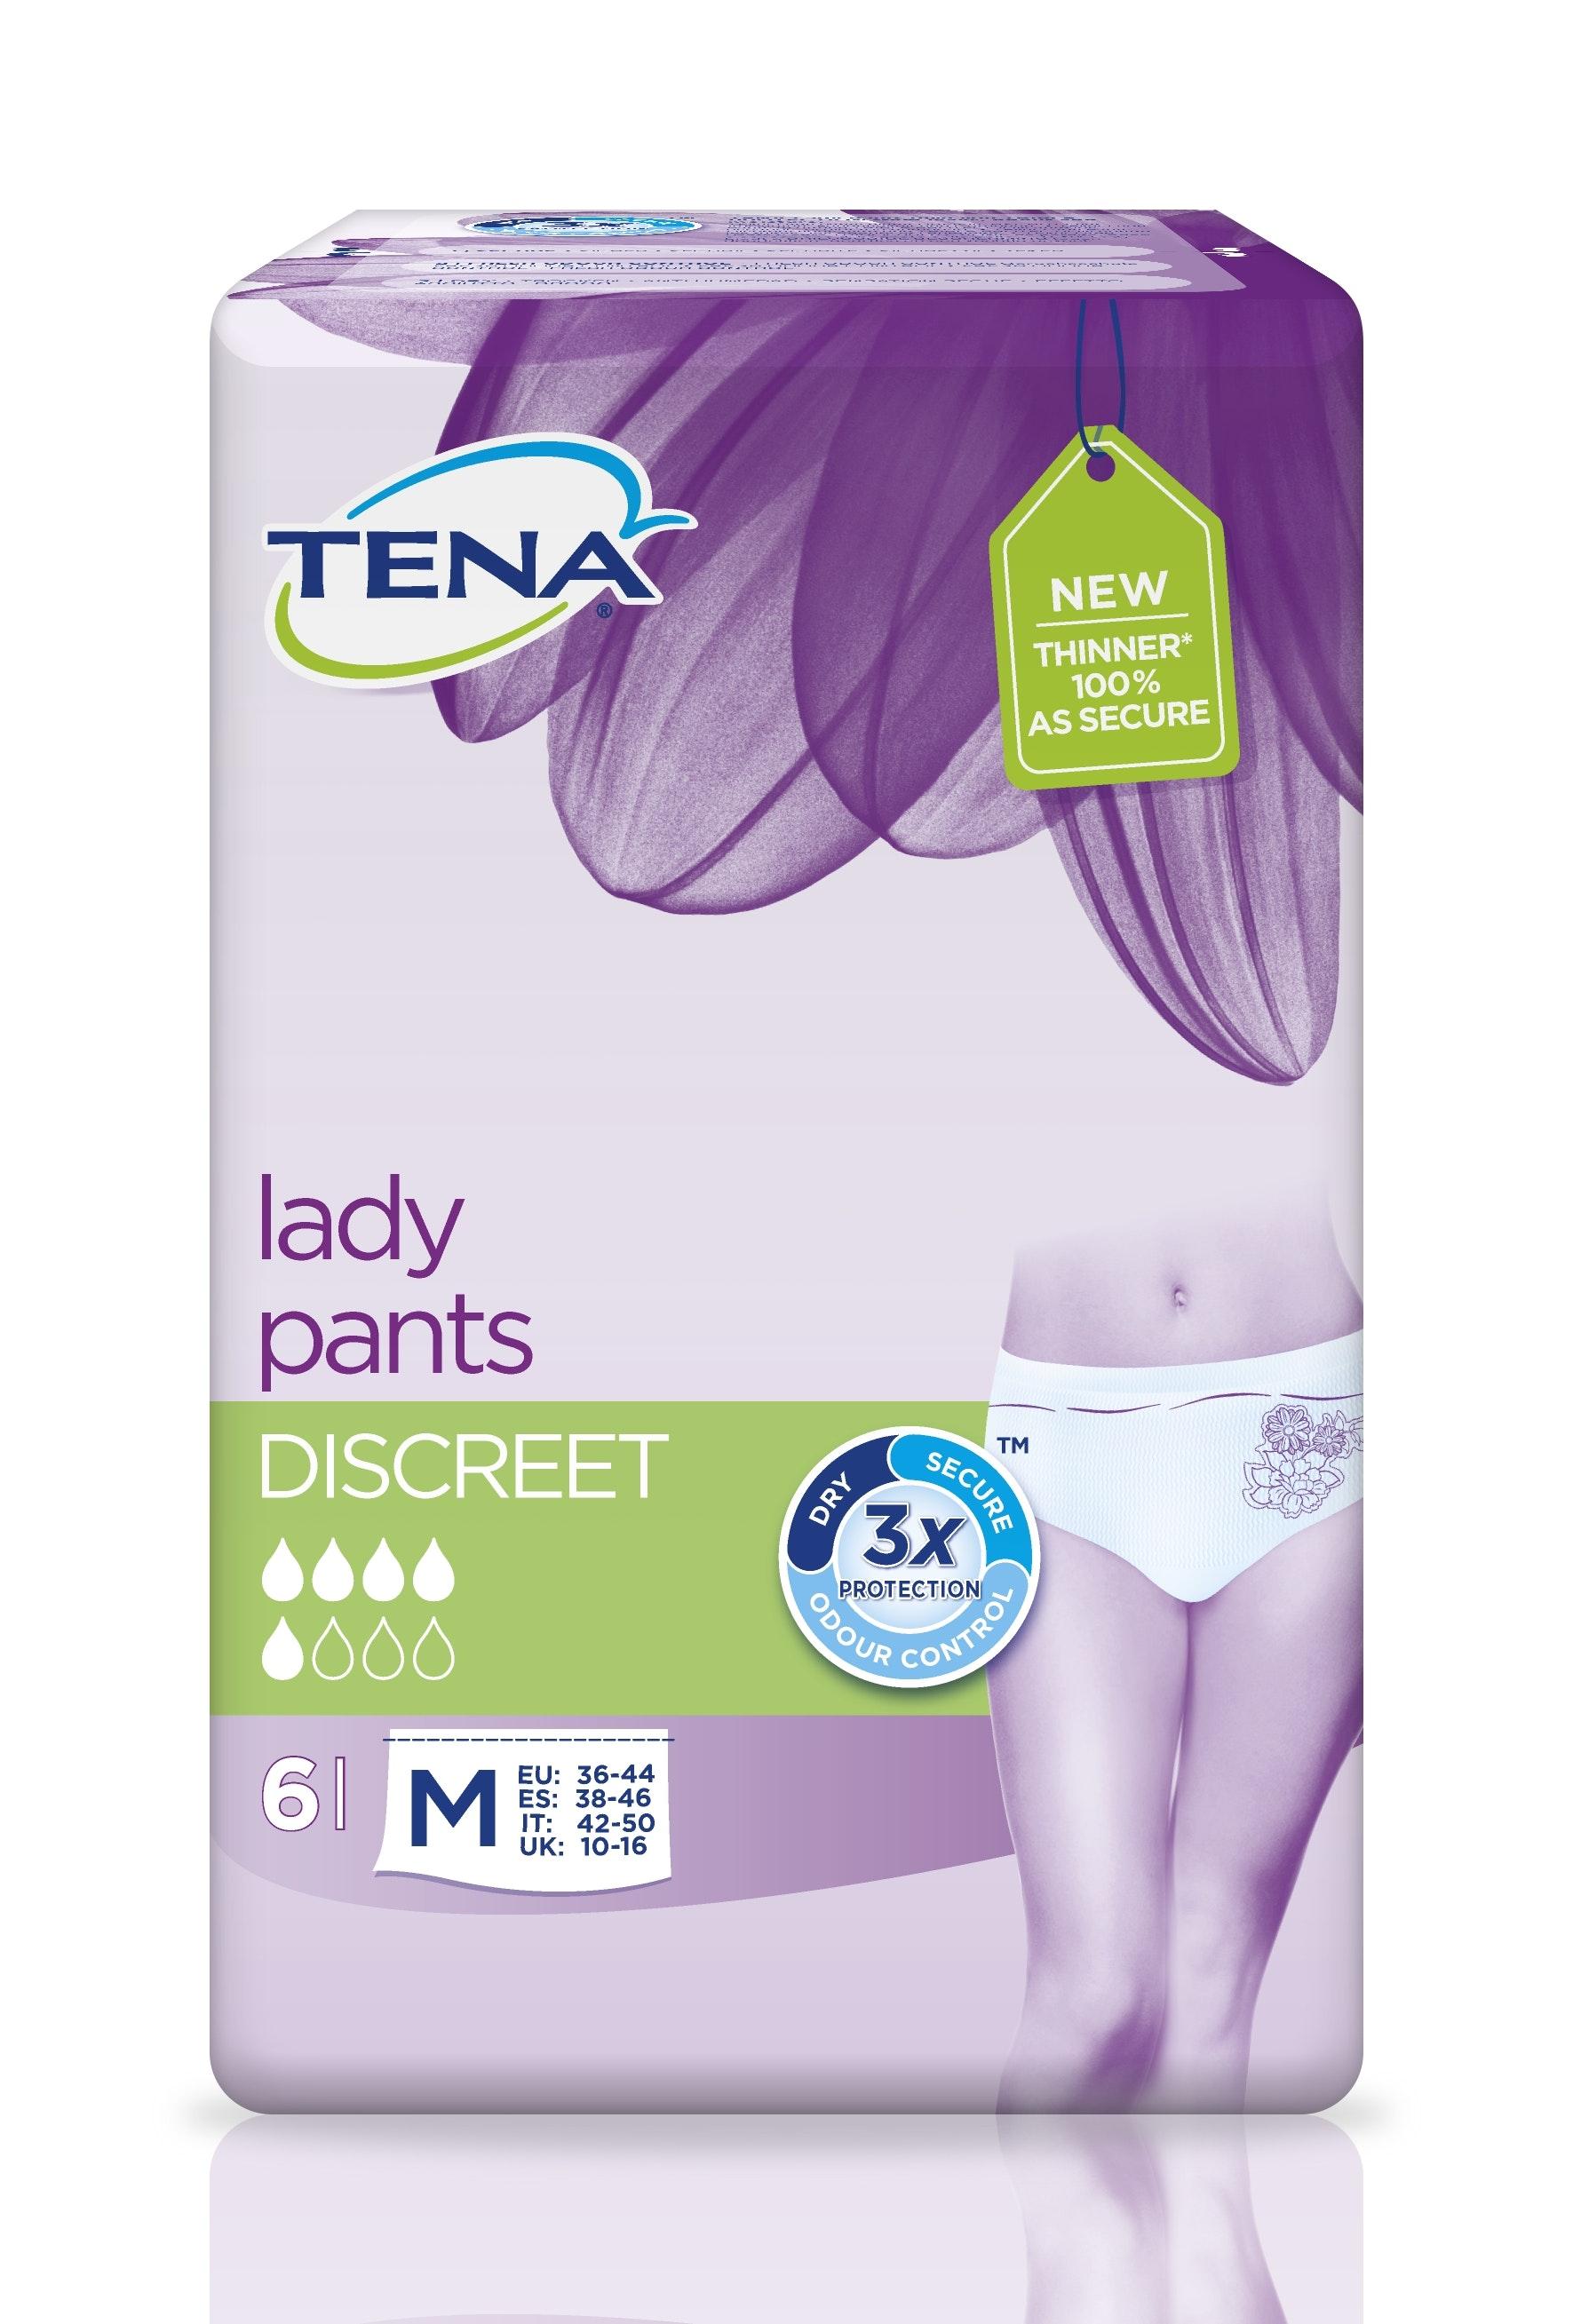 Tena lady pants discreet m 6p int